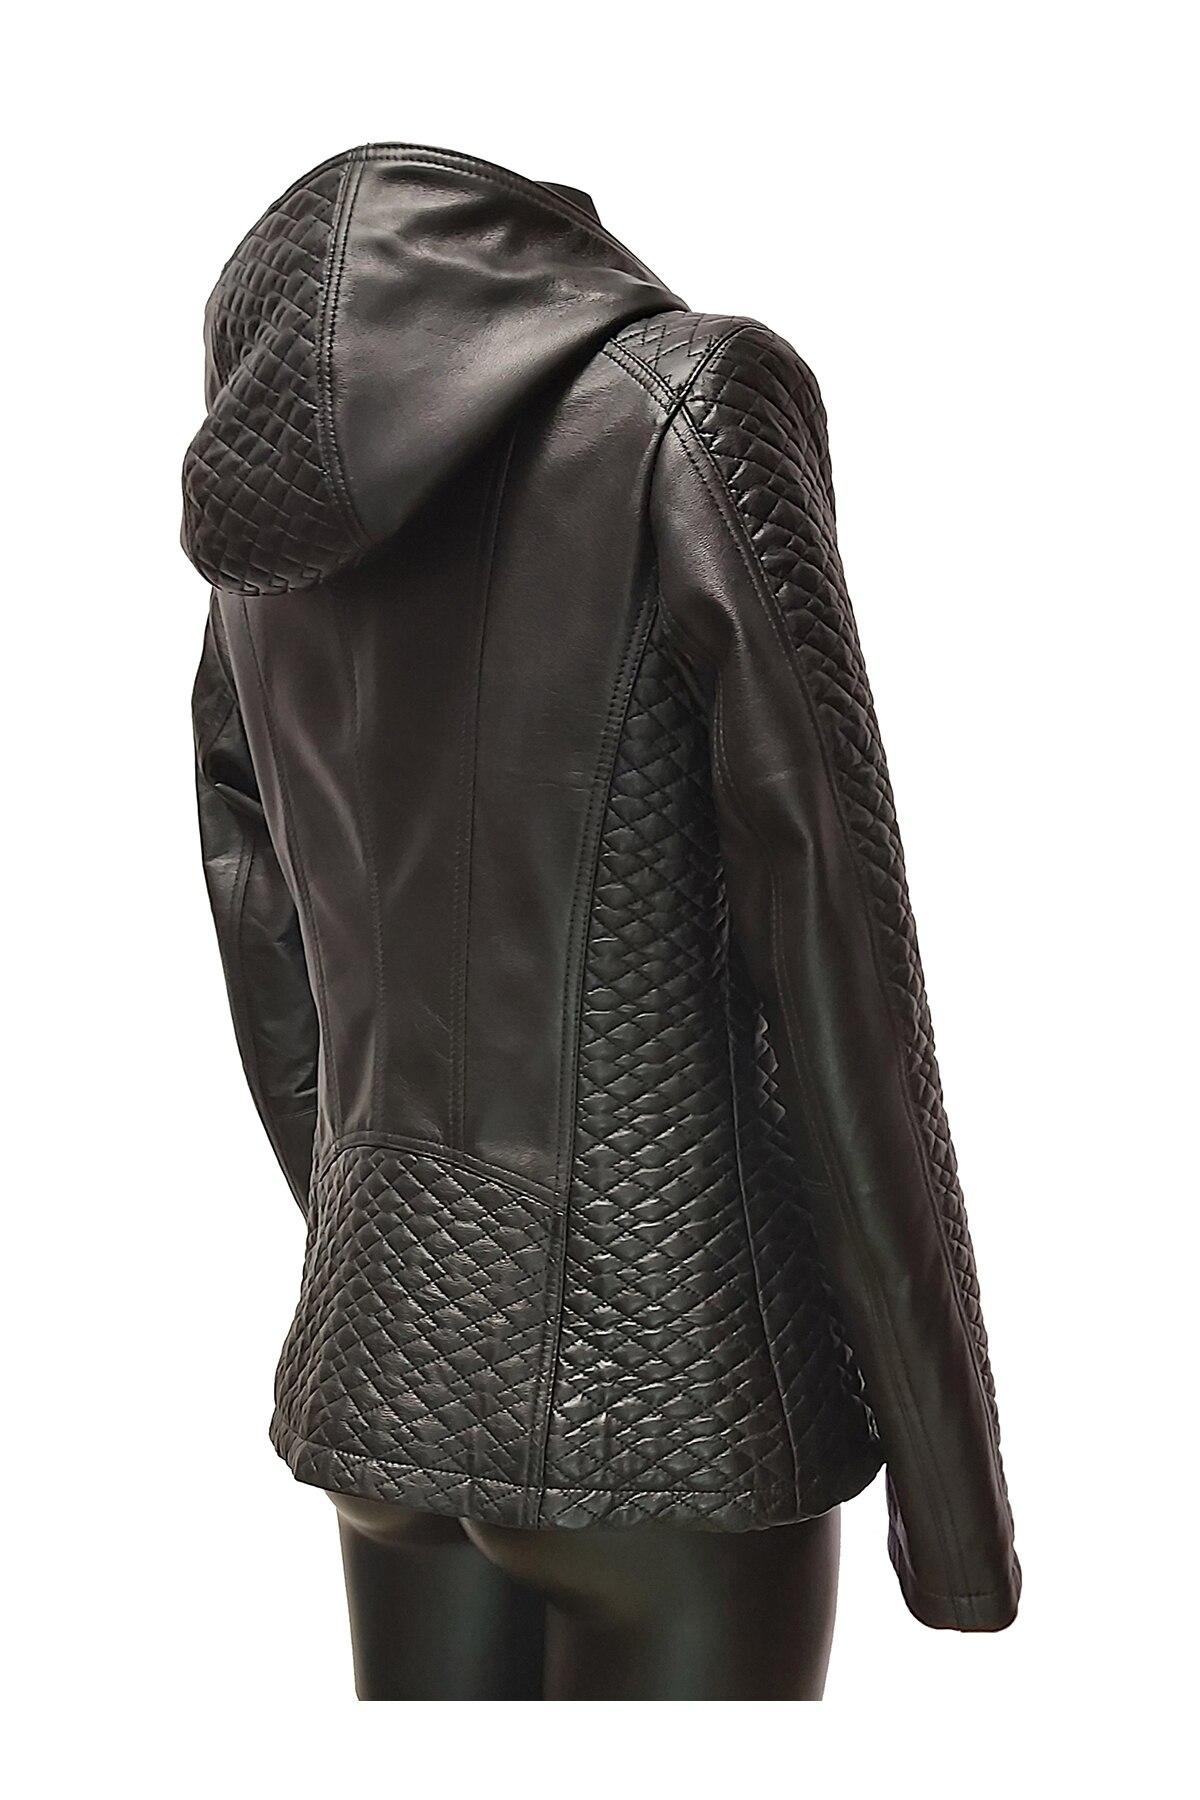 Sly Classic női bőrdzseki, fekete Réka 42 eMAG.hu